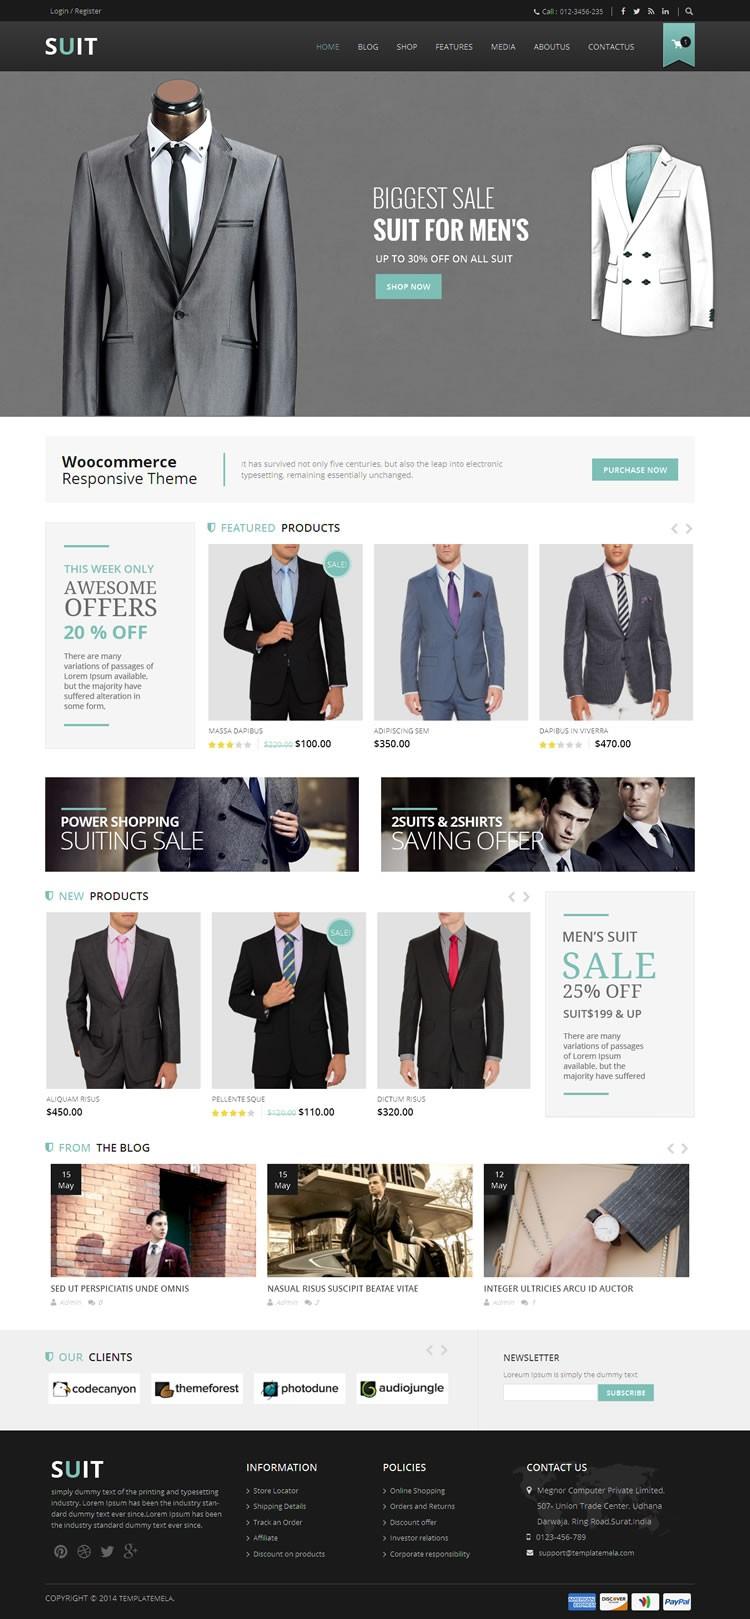 suit woocommerce responsive theme